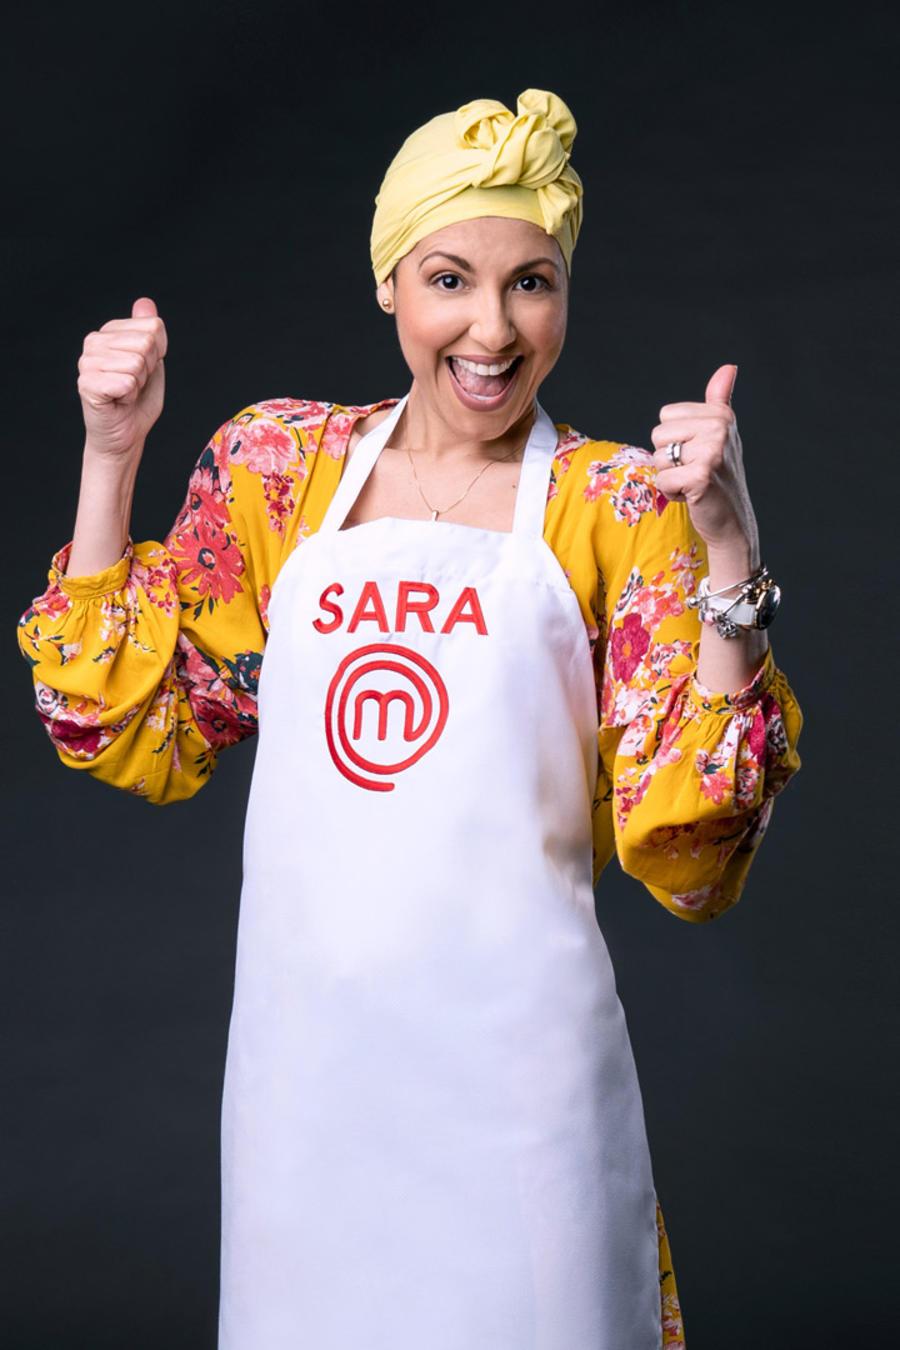 Sara Ordoñez novena eliminada de MasterChef Latino 2